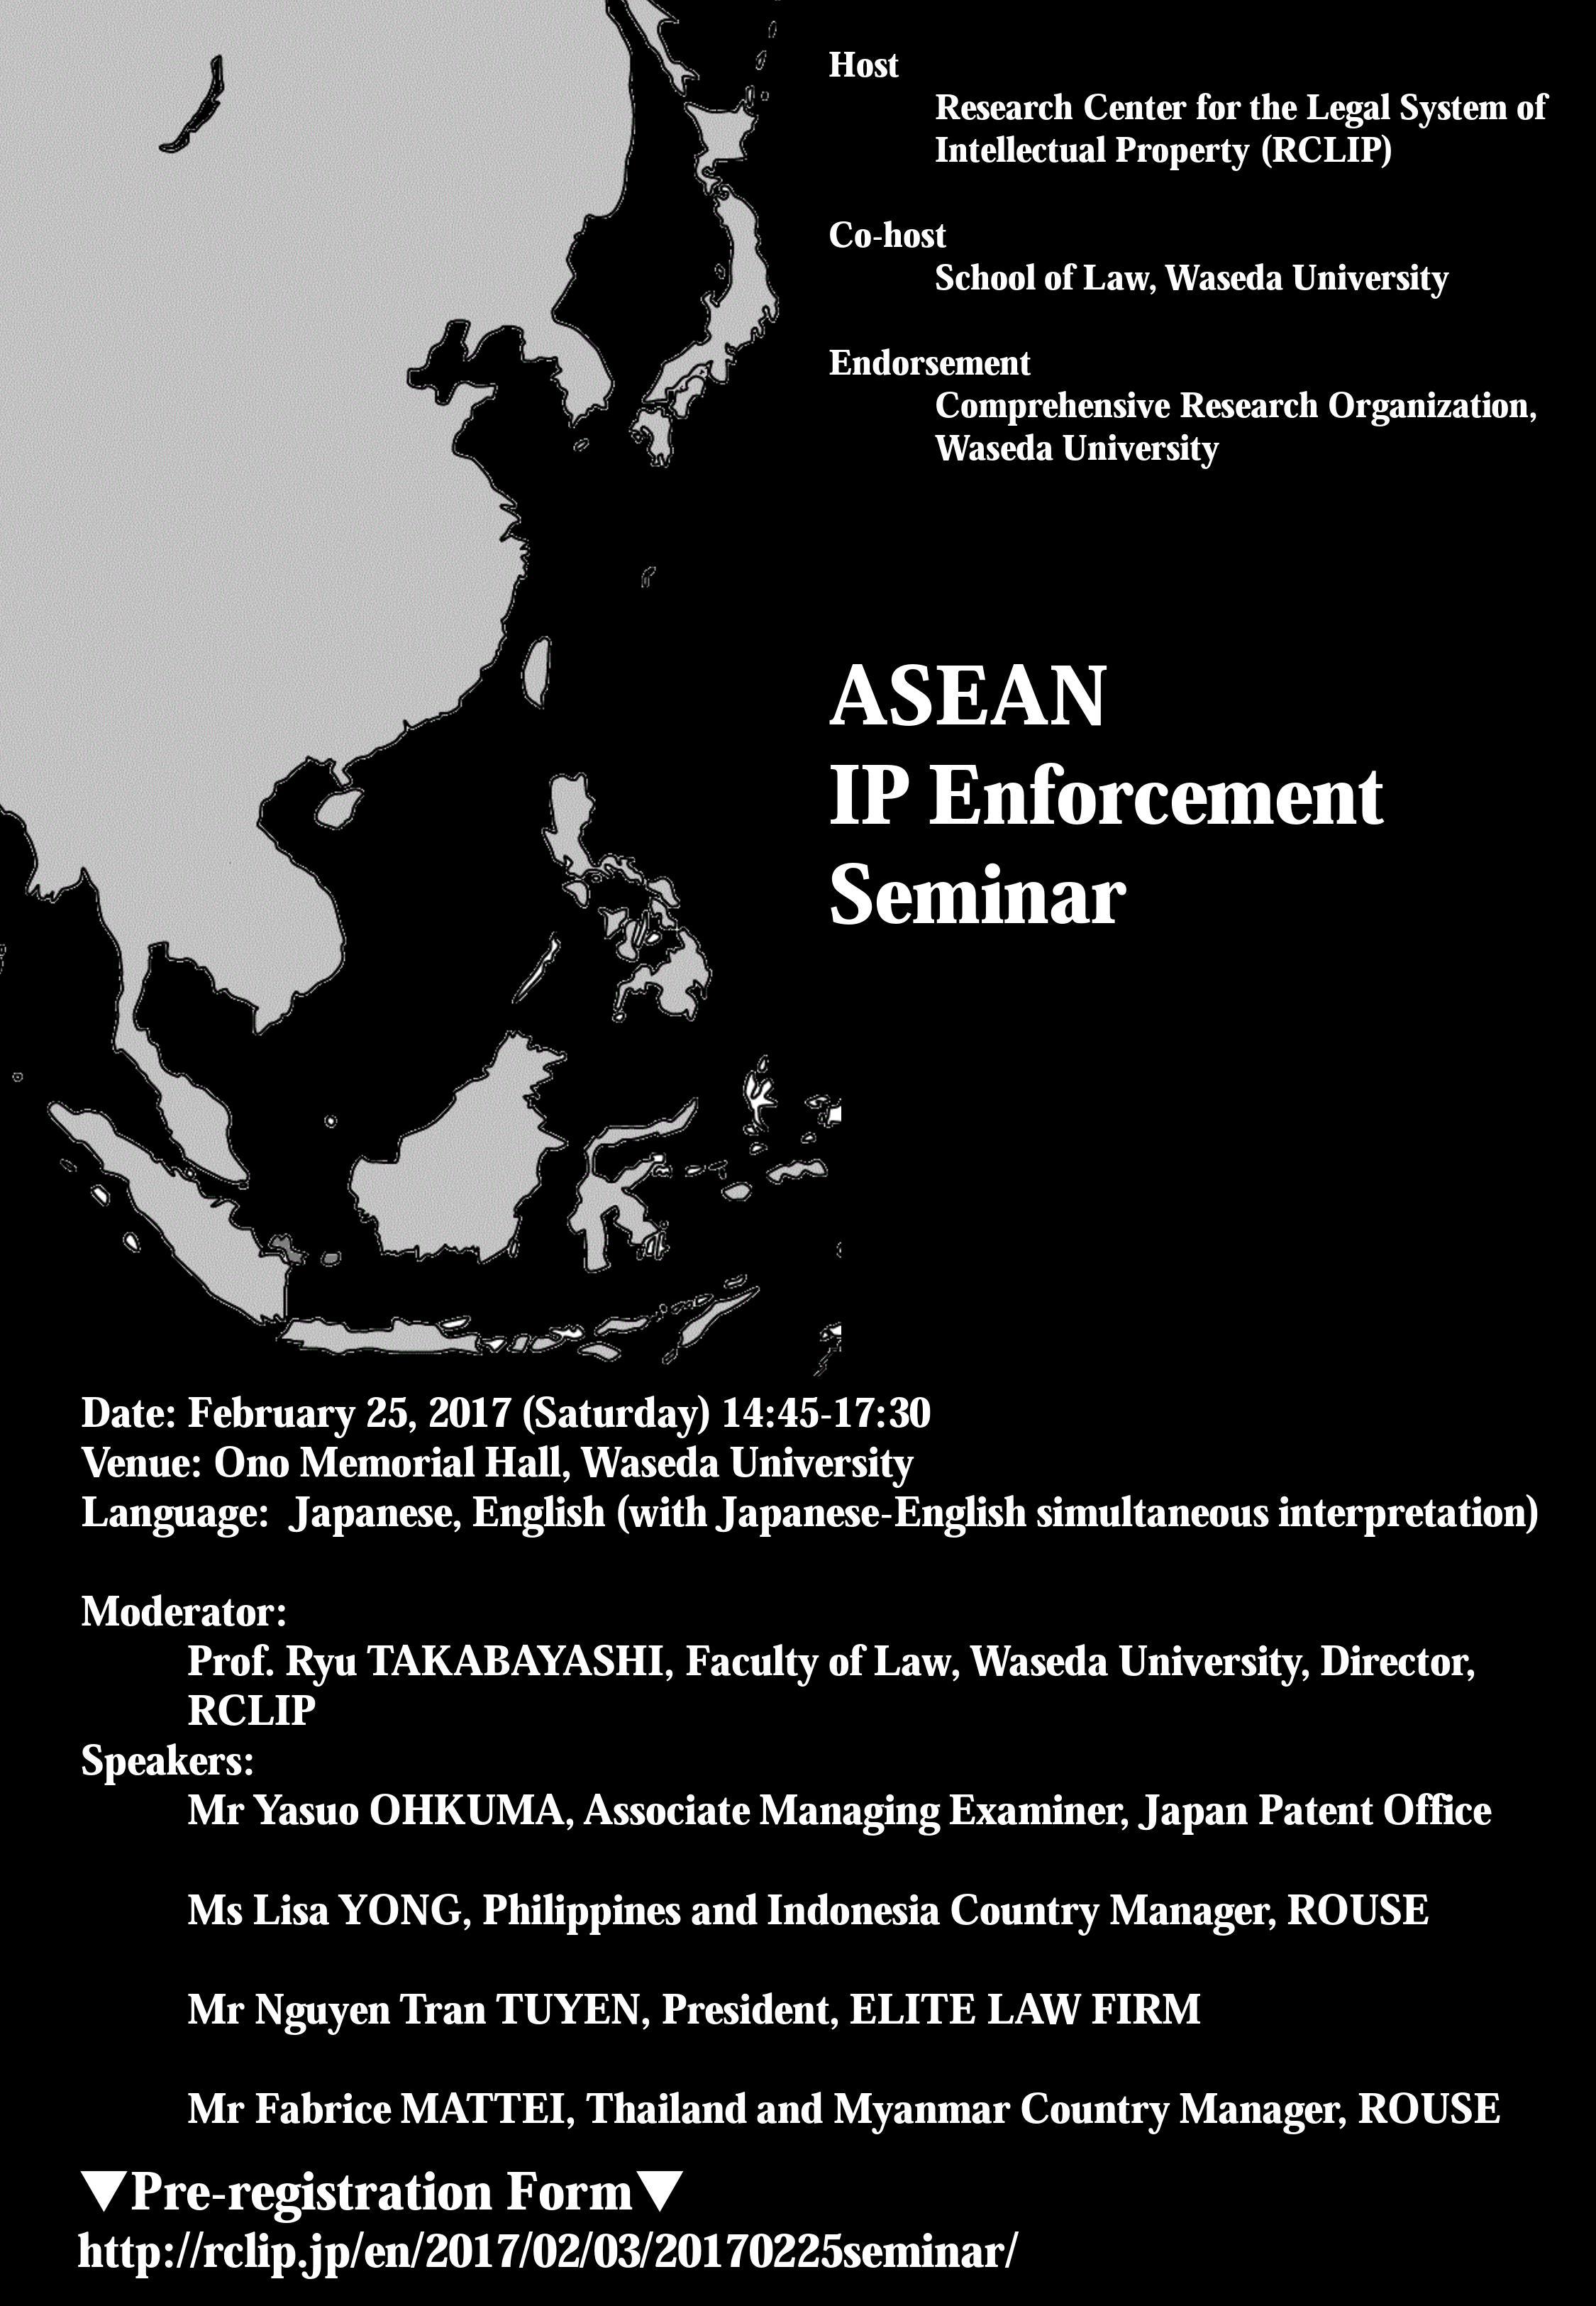 RCLIP Waseda Univ. ASEAN IP Seminar